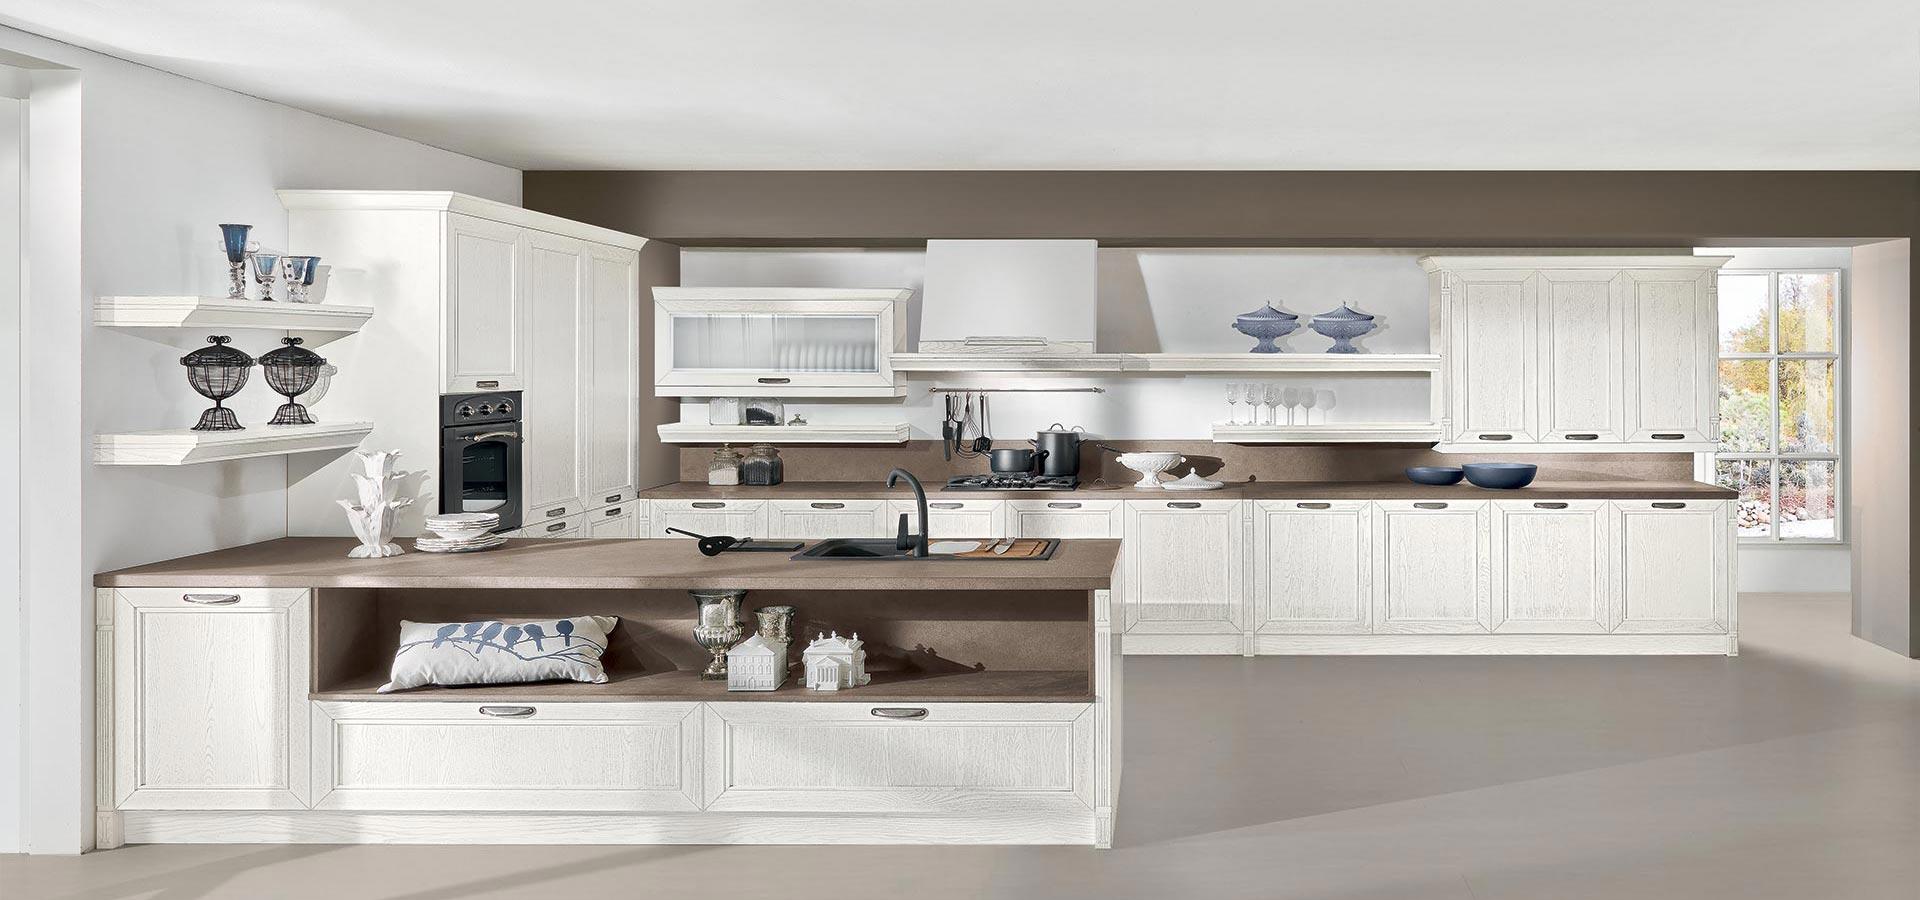 Opera classical kitchen arredo3 for Cucine classiche arredo 3